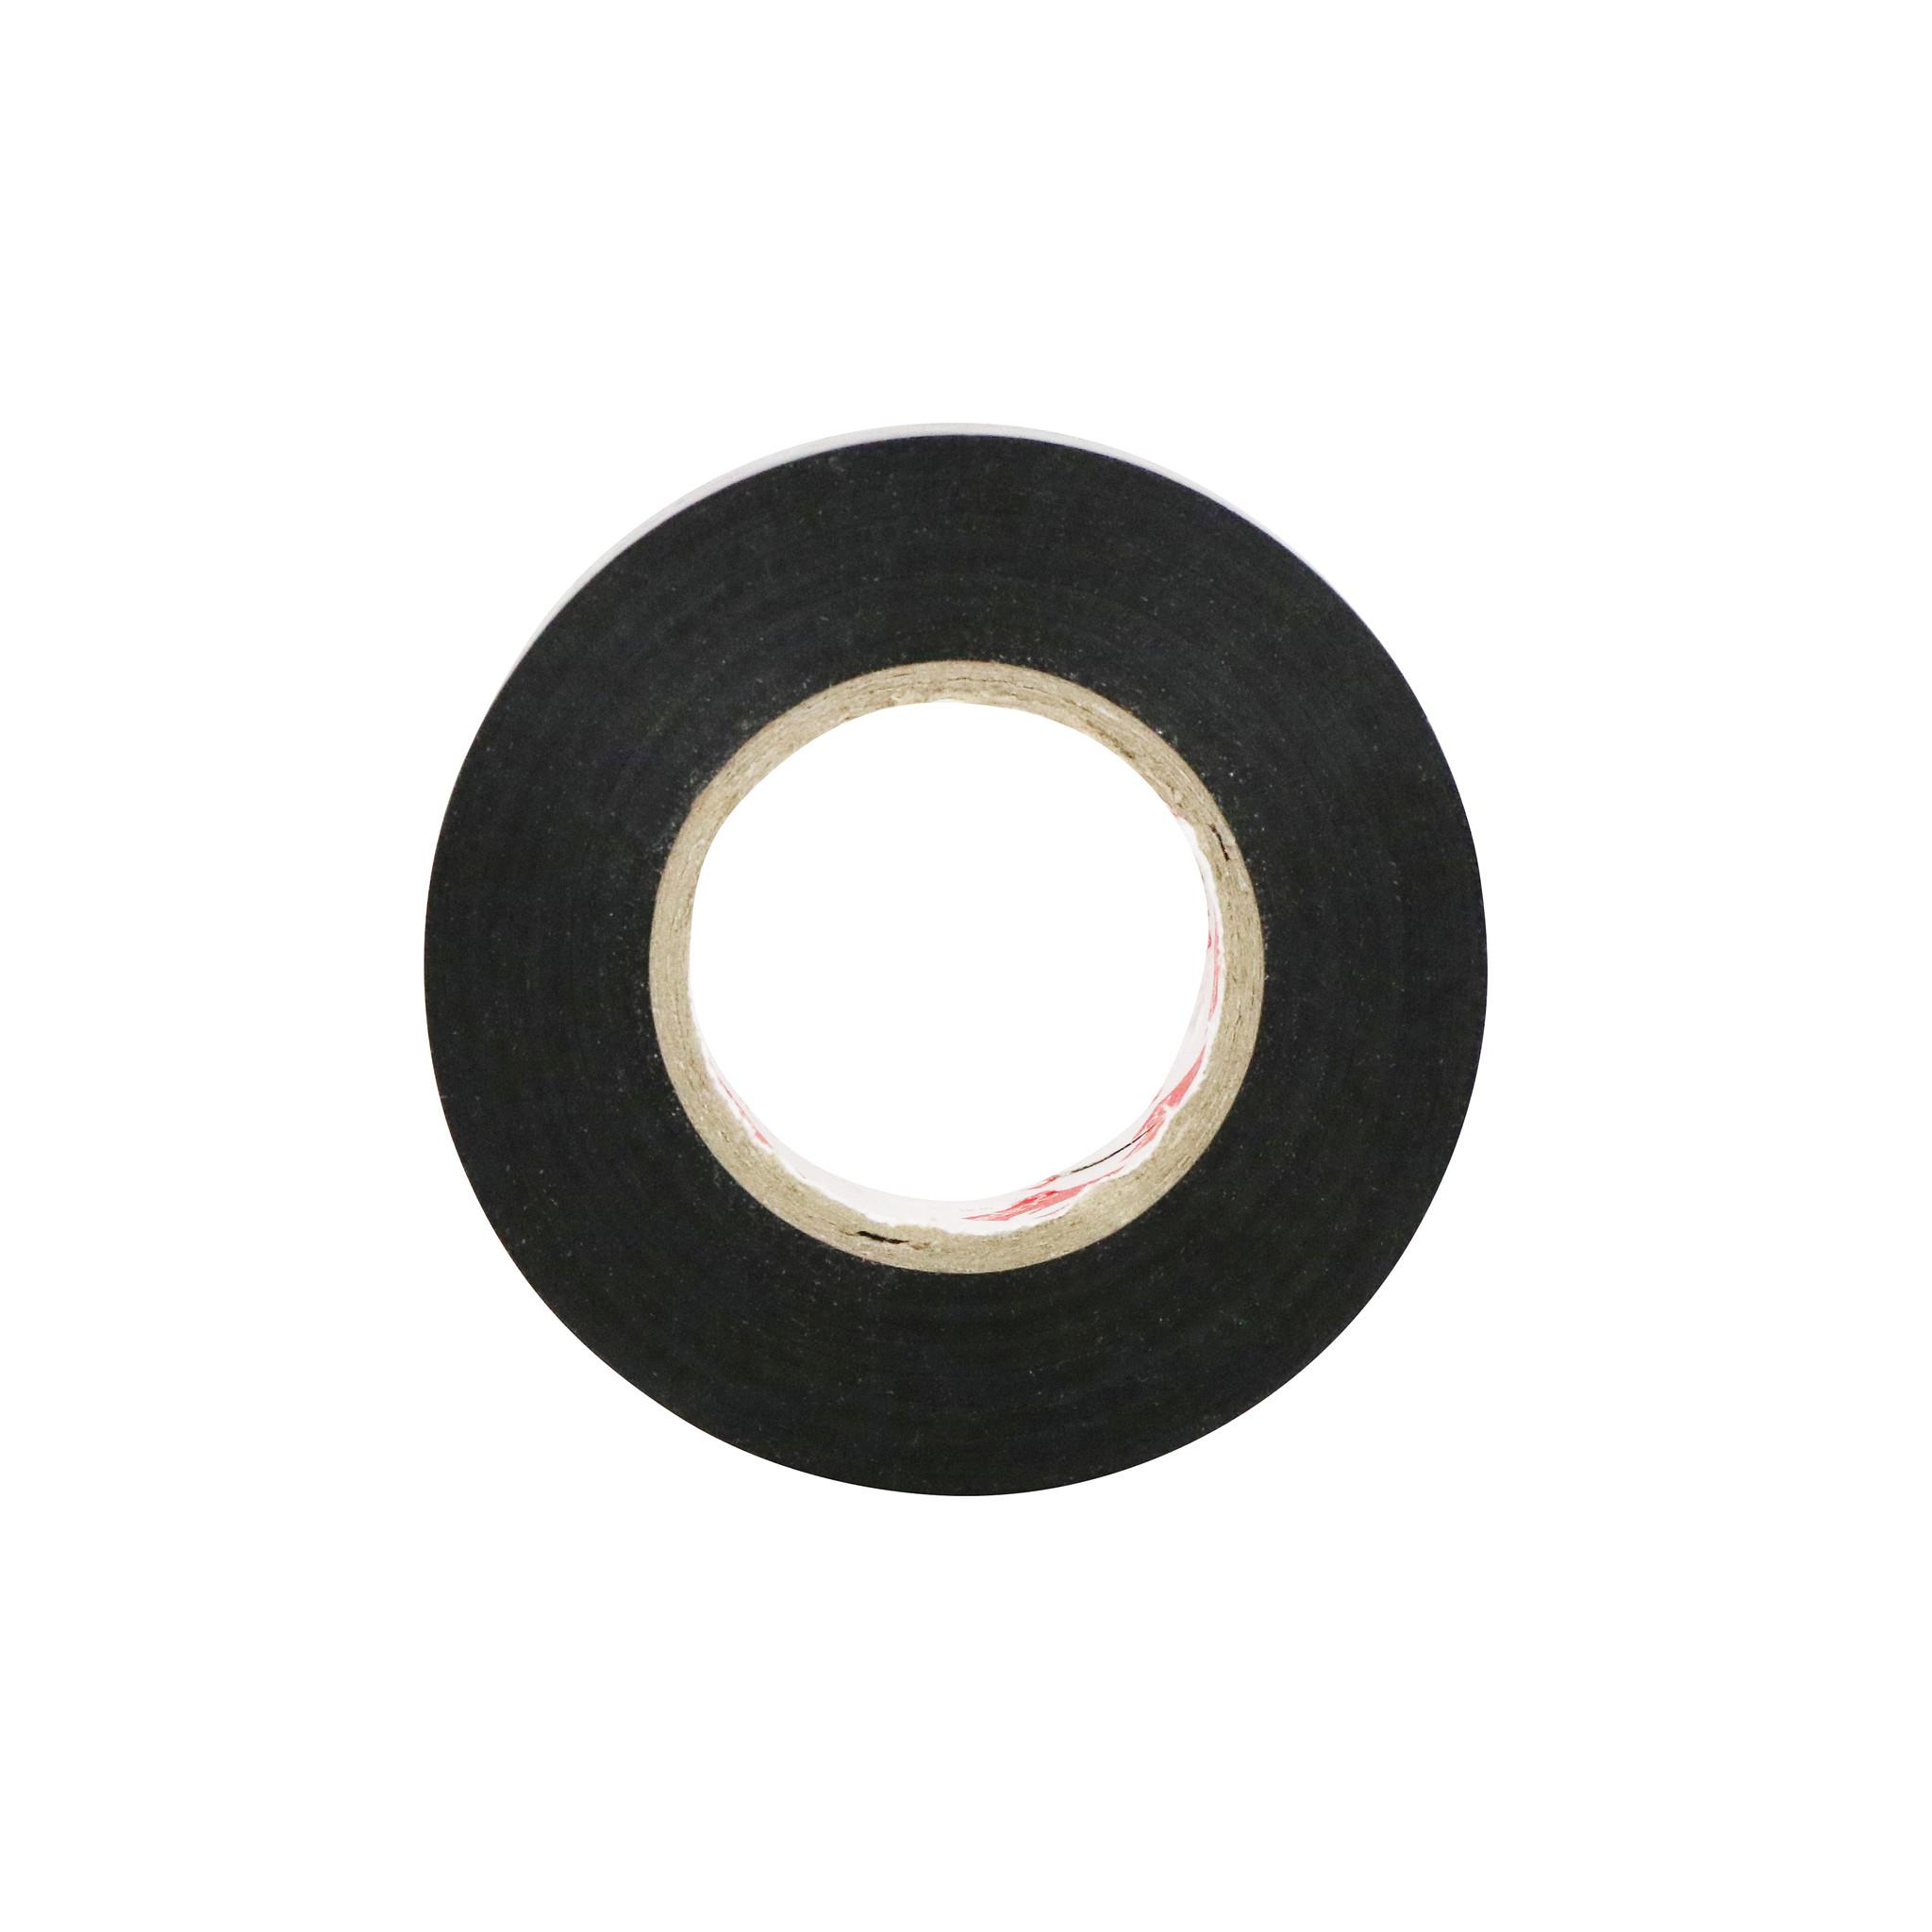 Womi W407 PVC Isolation tape 19mm x 20m Zwart 8x kopen